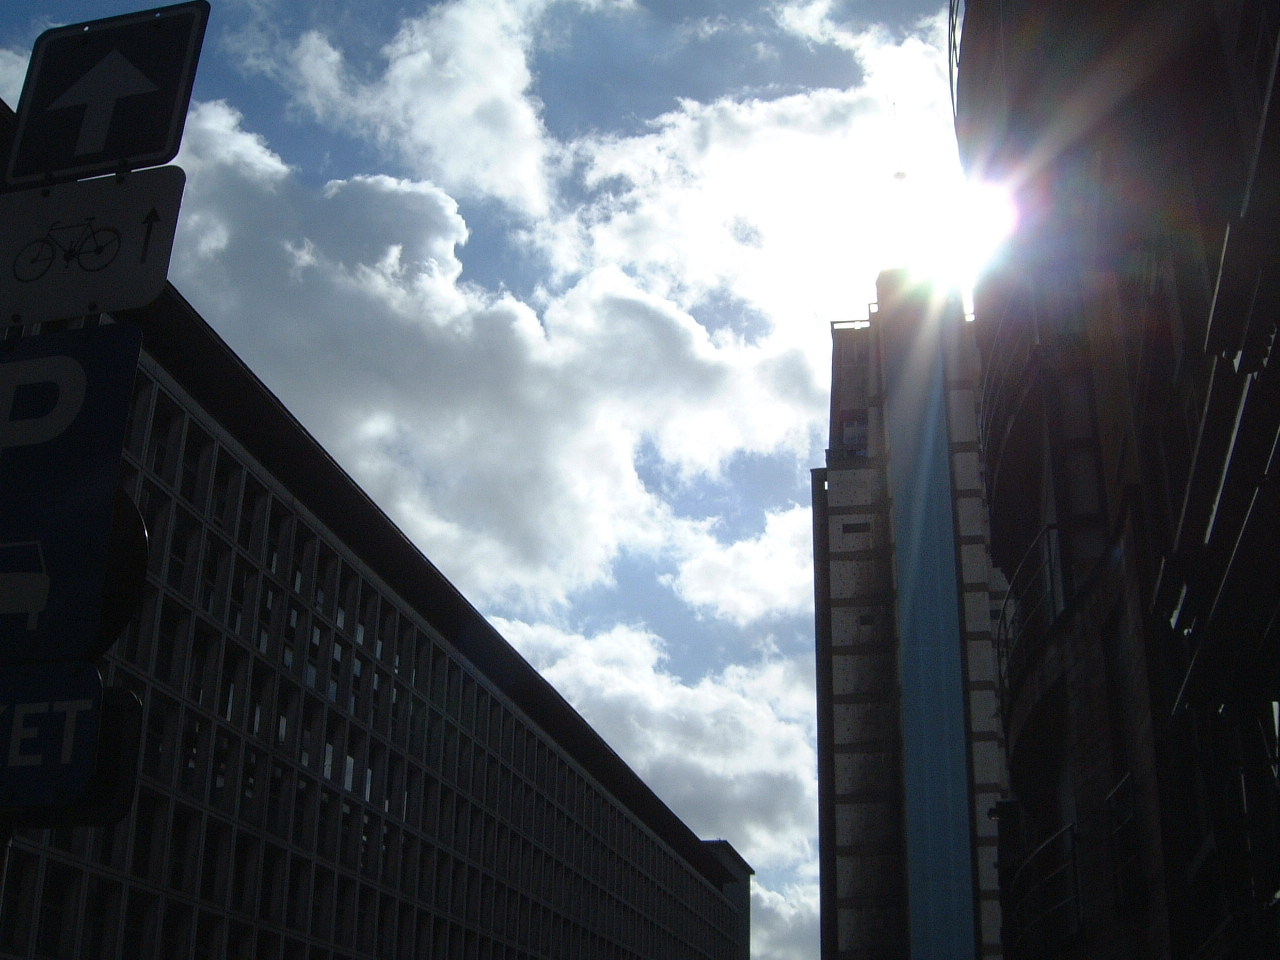 maartent architecture exteriors flat flats skyscrapers skyscraper belgium building buildings office offices cityscape silhouette